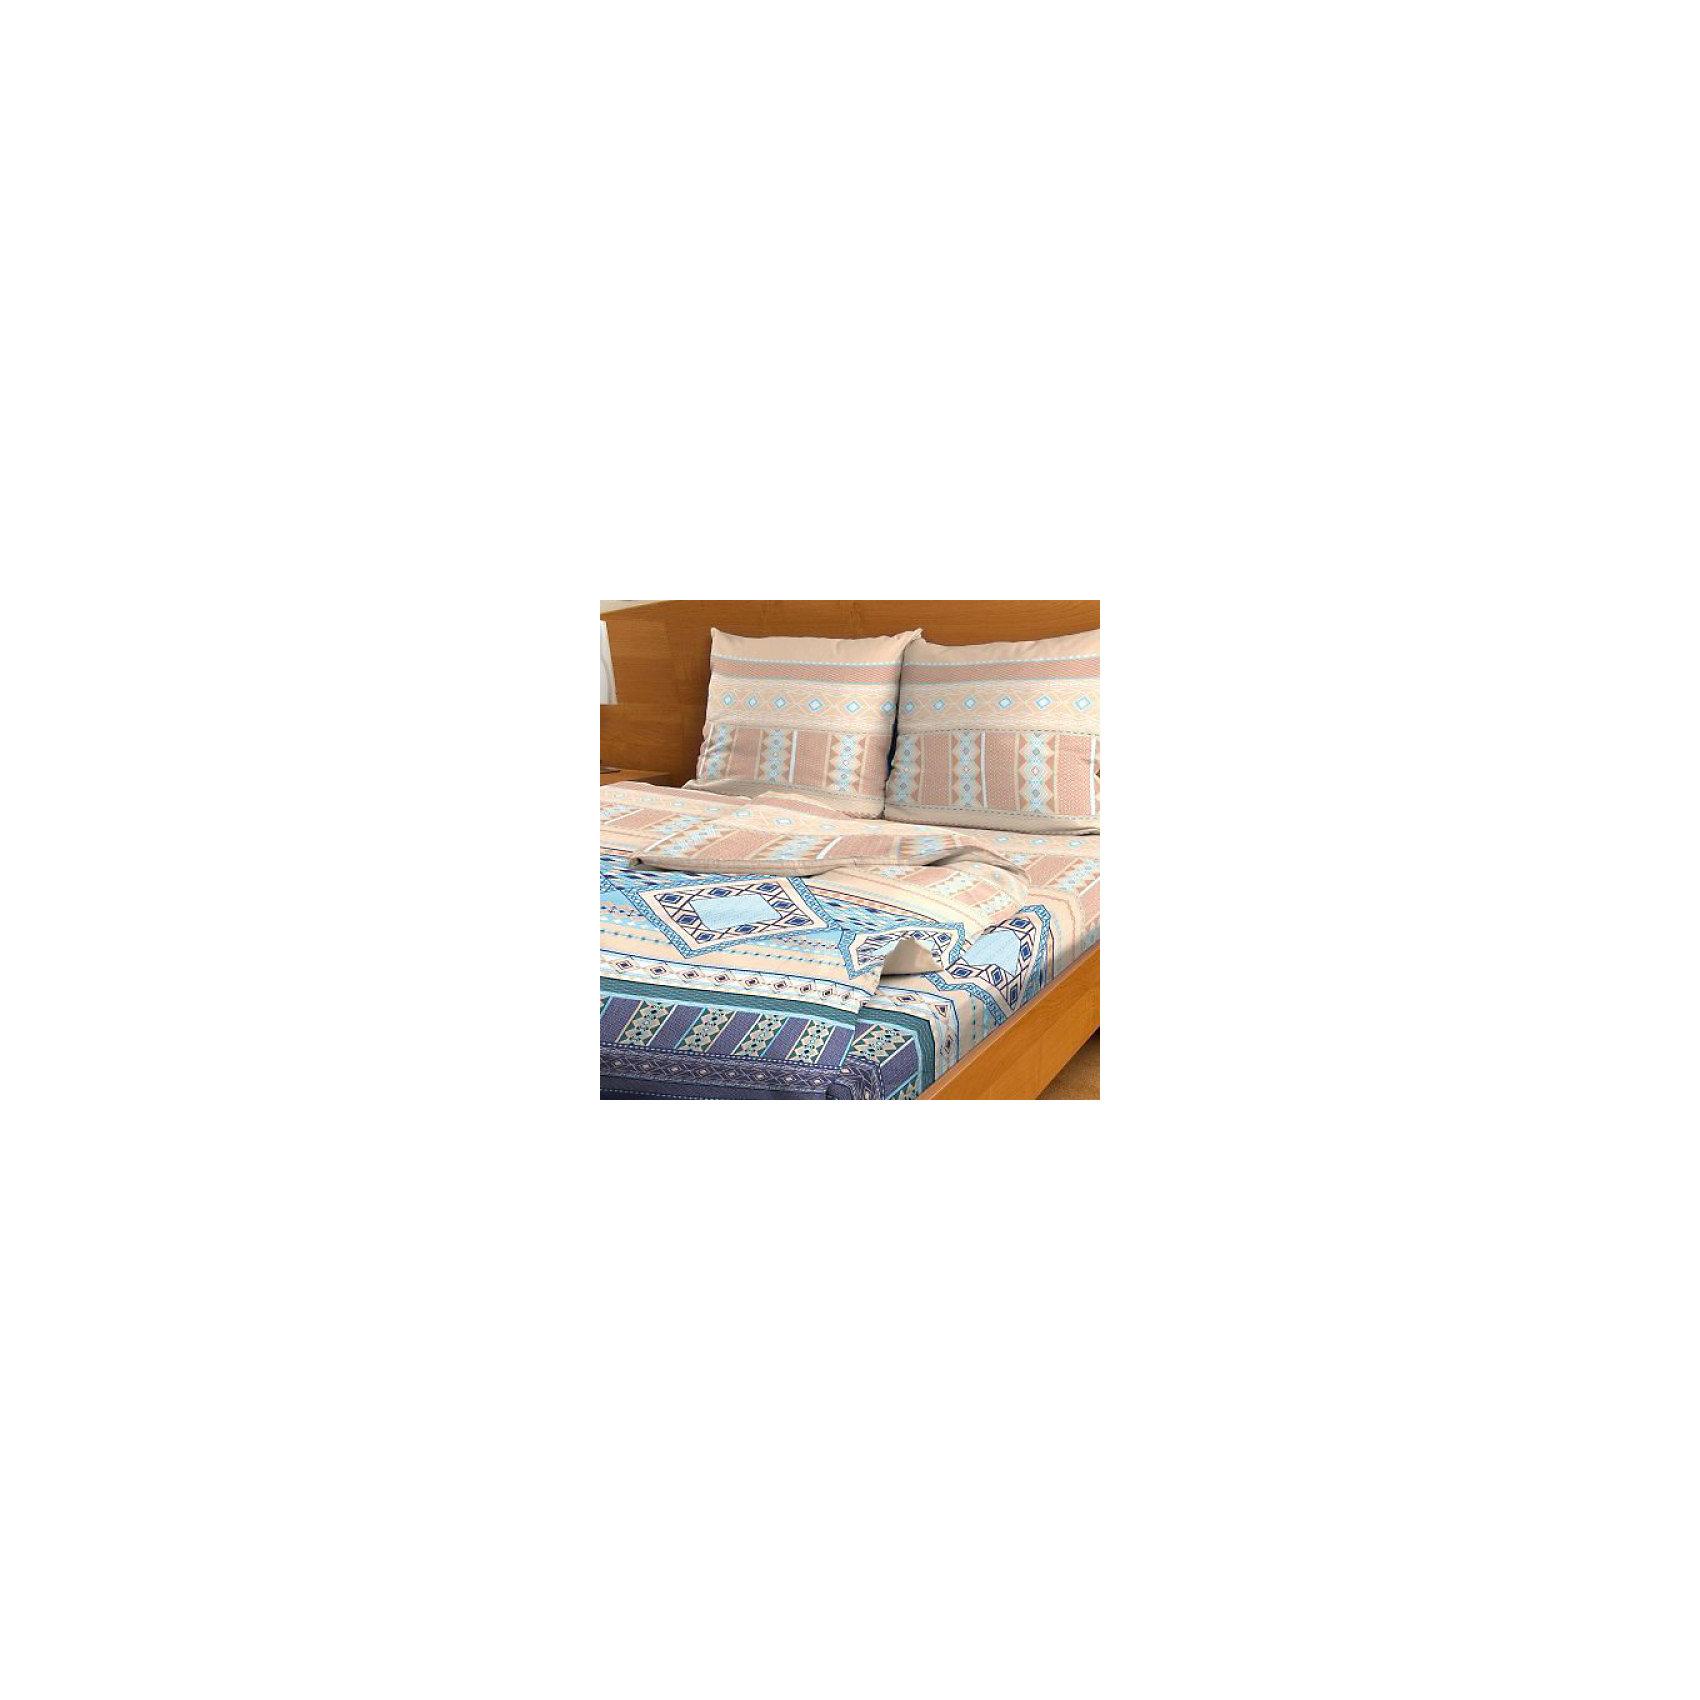 Letto Постельное белье 2,0 сп B94, Бязь, Letto (нав.70*70) комплект белья letto семейный наволочки 70х70 цвет голубой синий b183 7